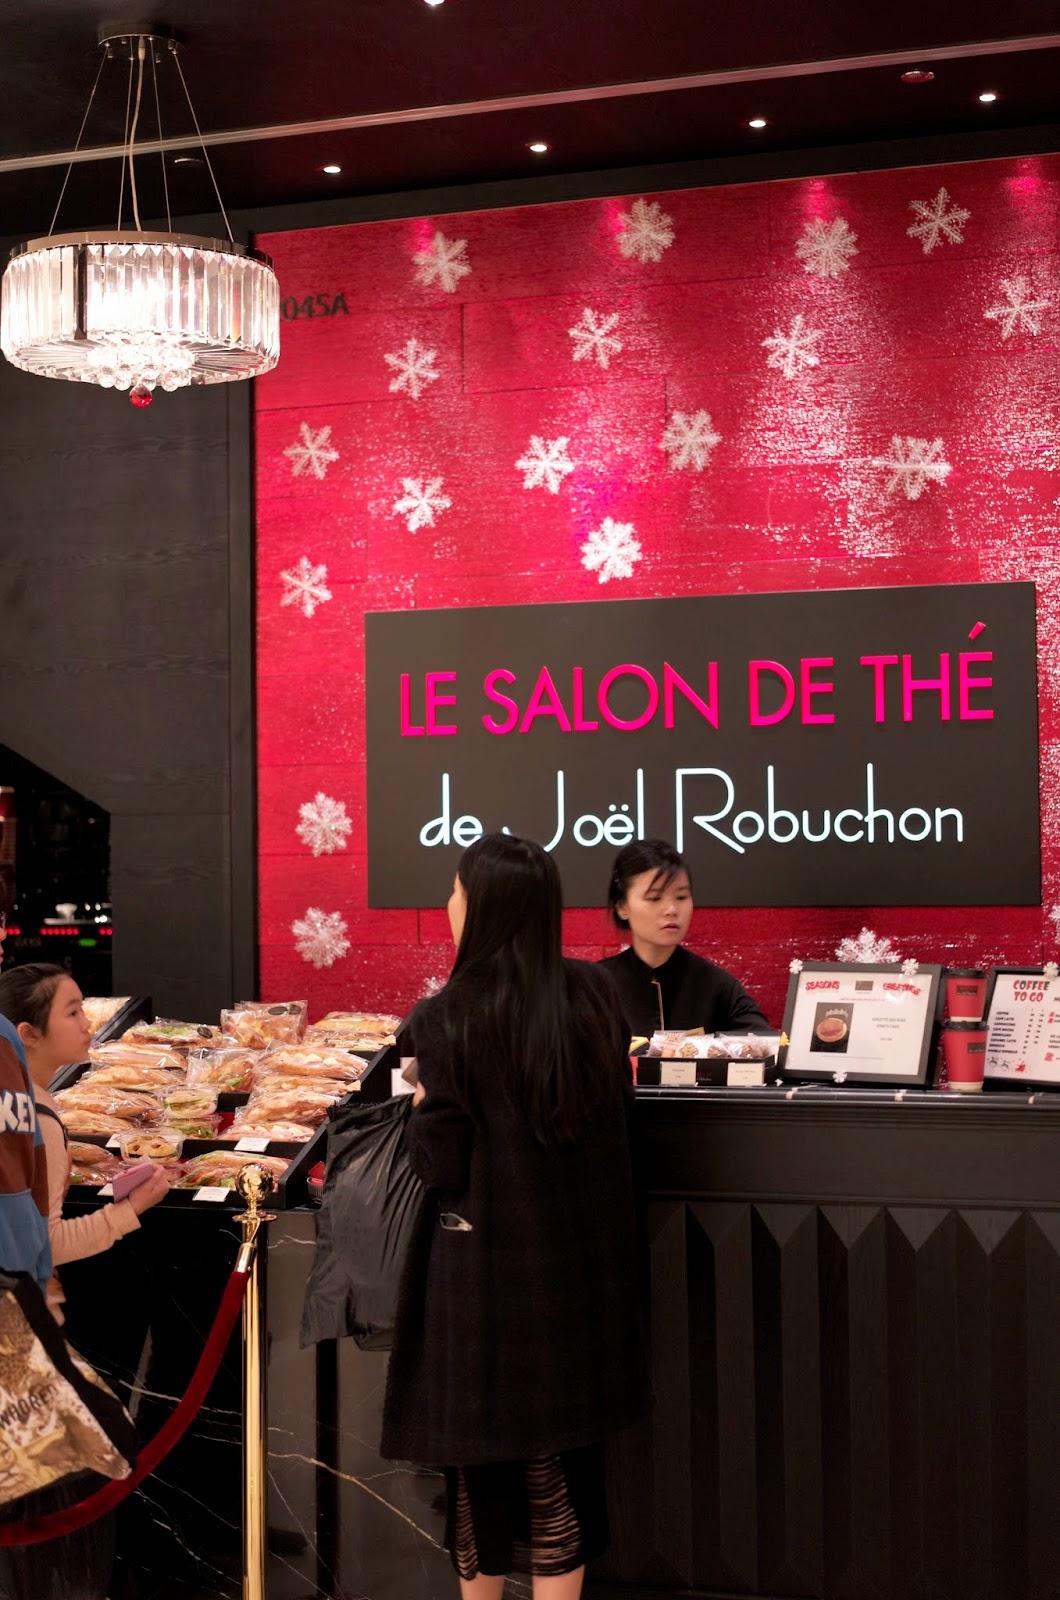 Afternoon tea at le salon de the de joel robuchon ifc - Salon de joel robuchon ...